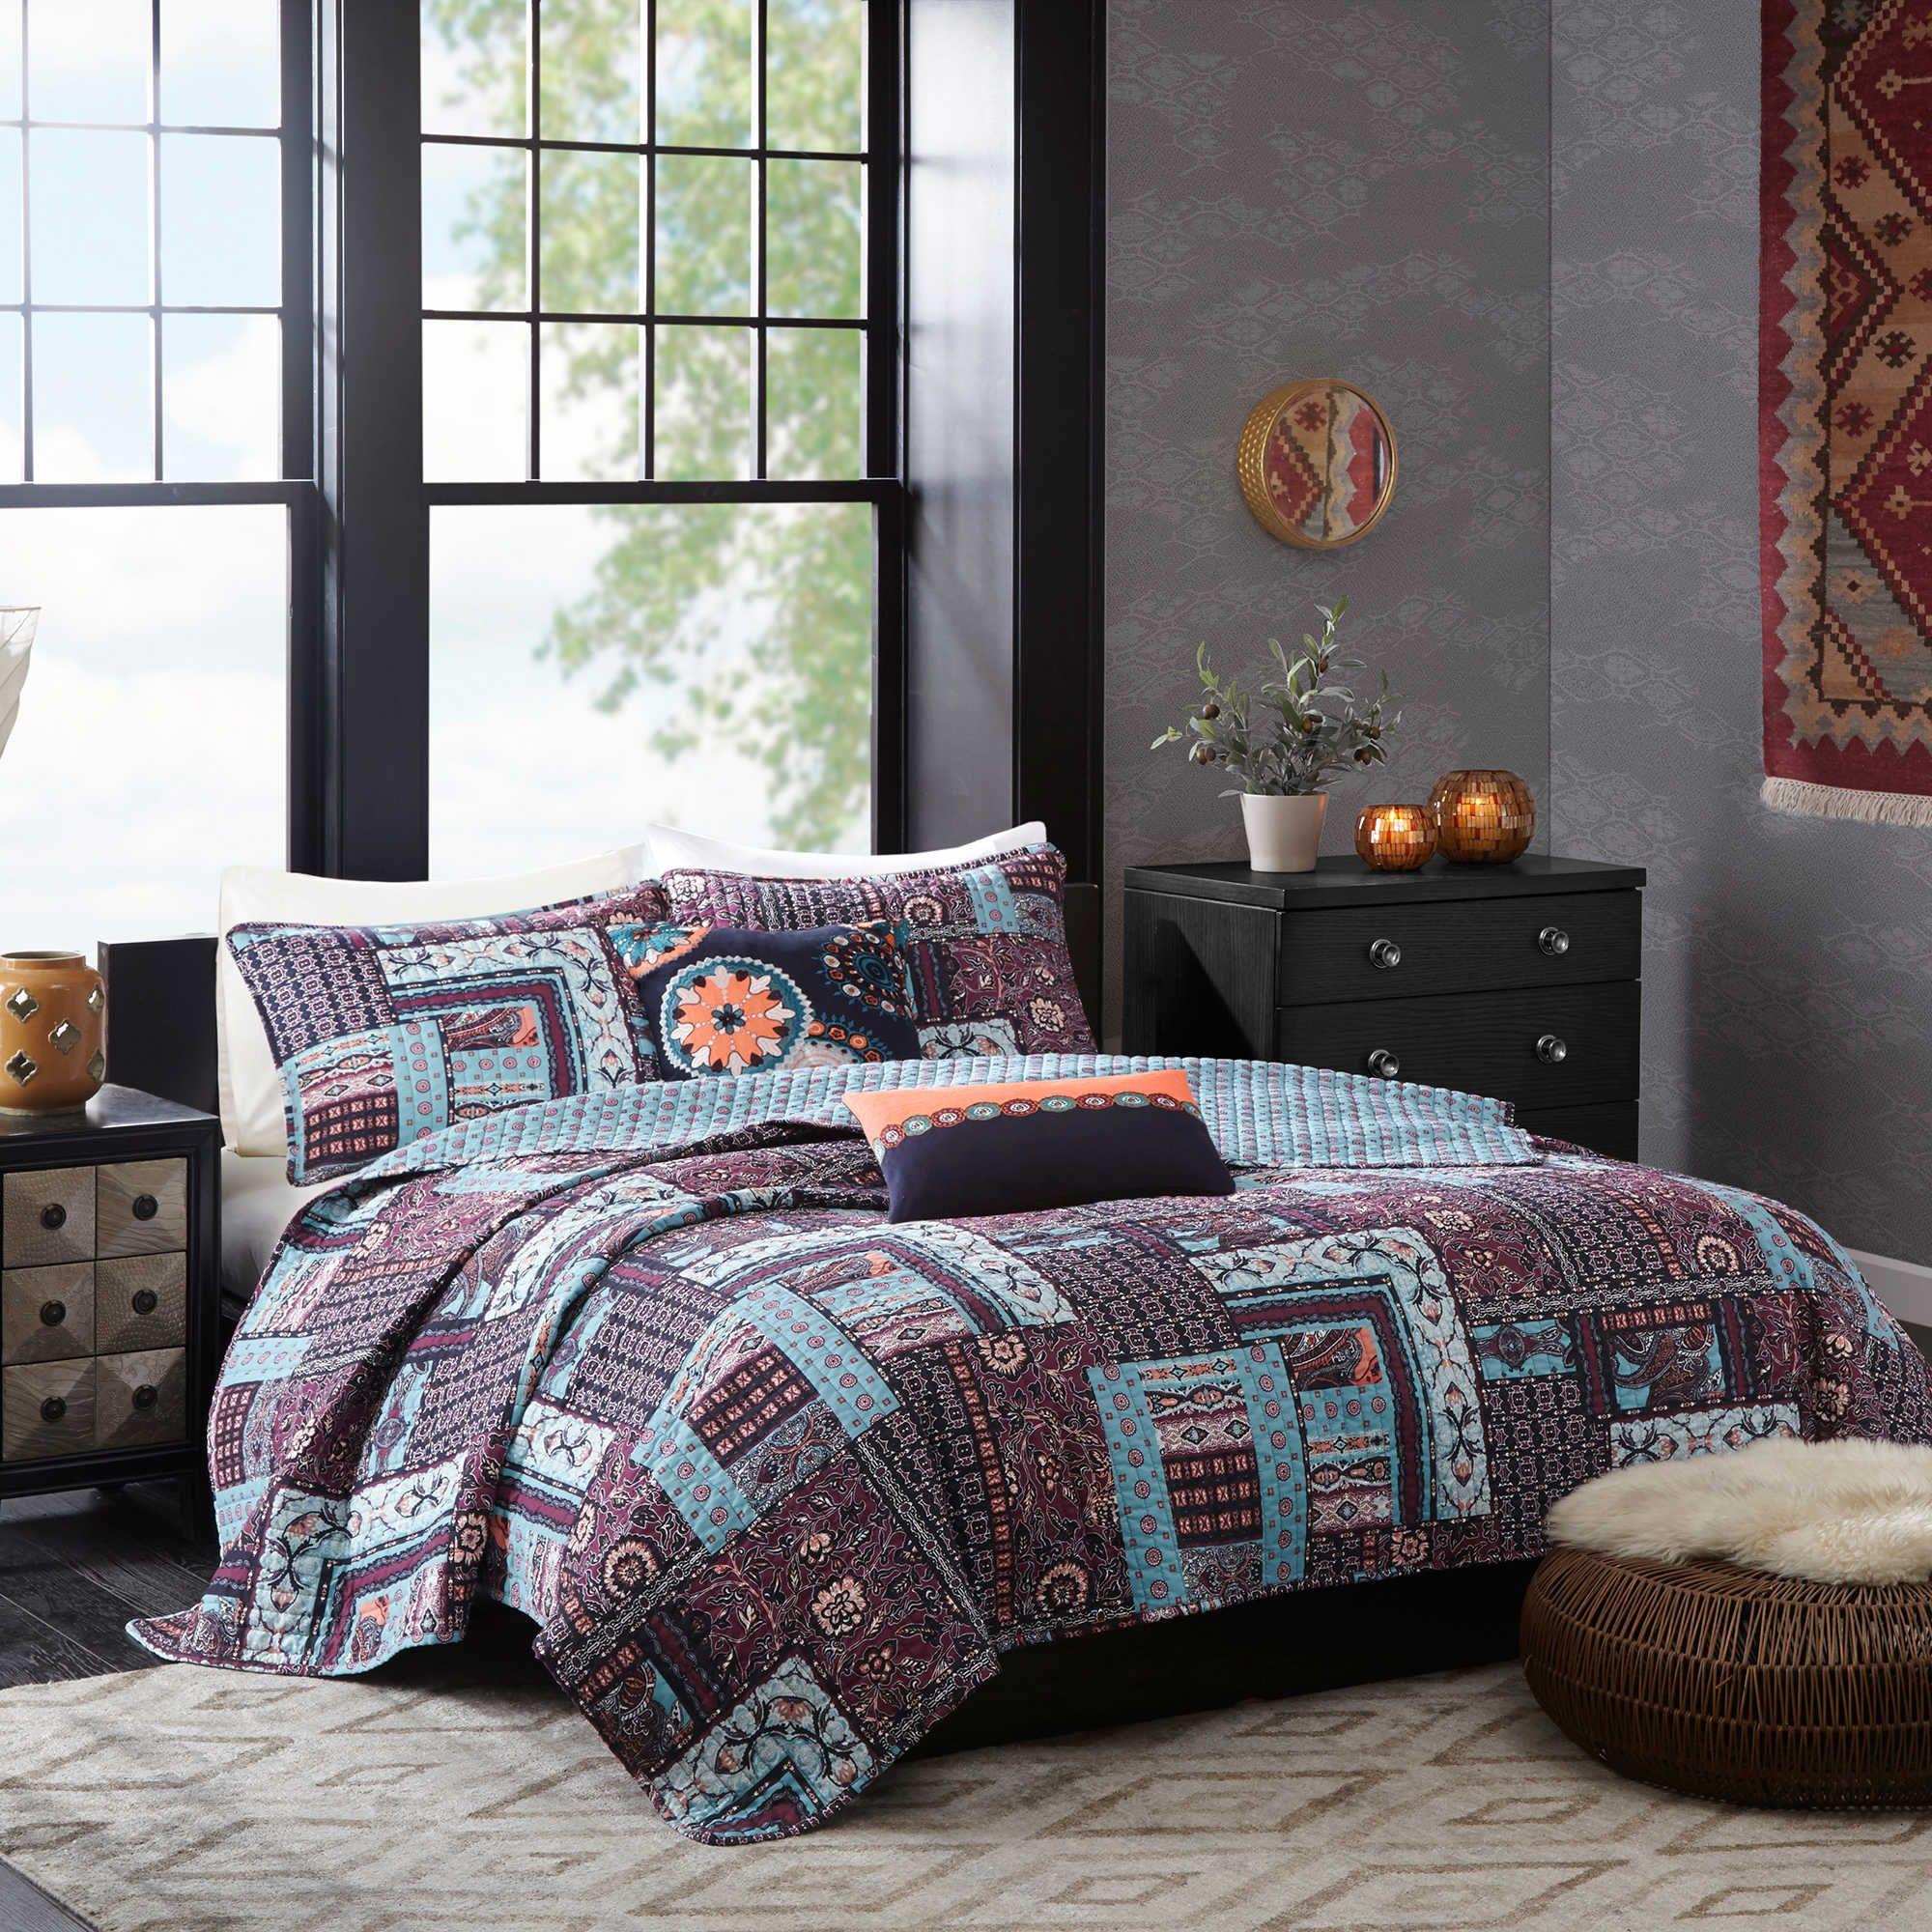 ideas bedroom set comforters aria moroccan lavish quilt home geometric purple gold print and comforter bedding sets piece